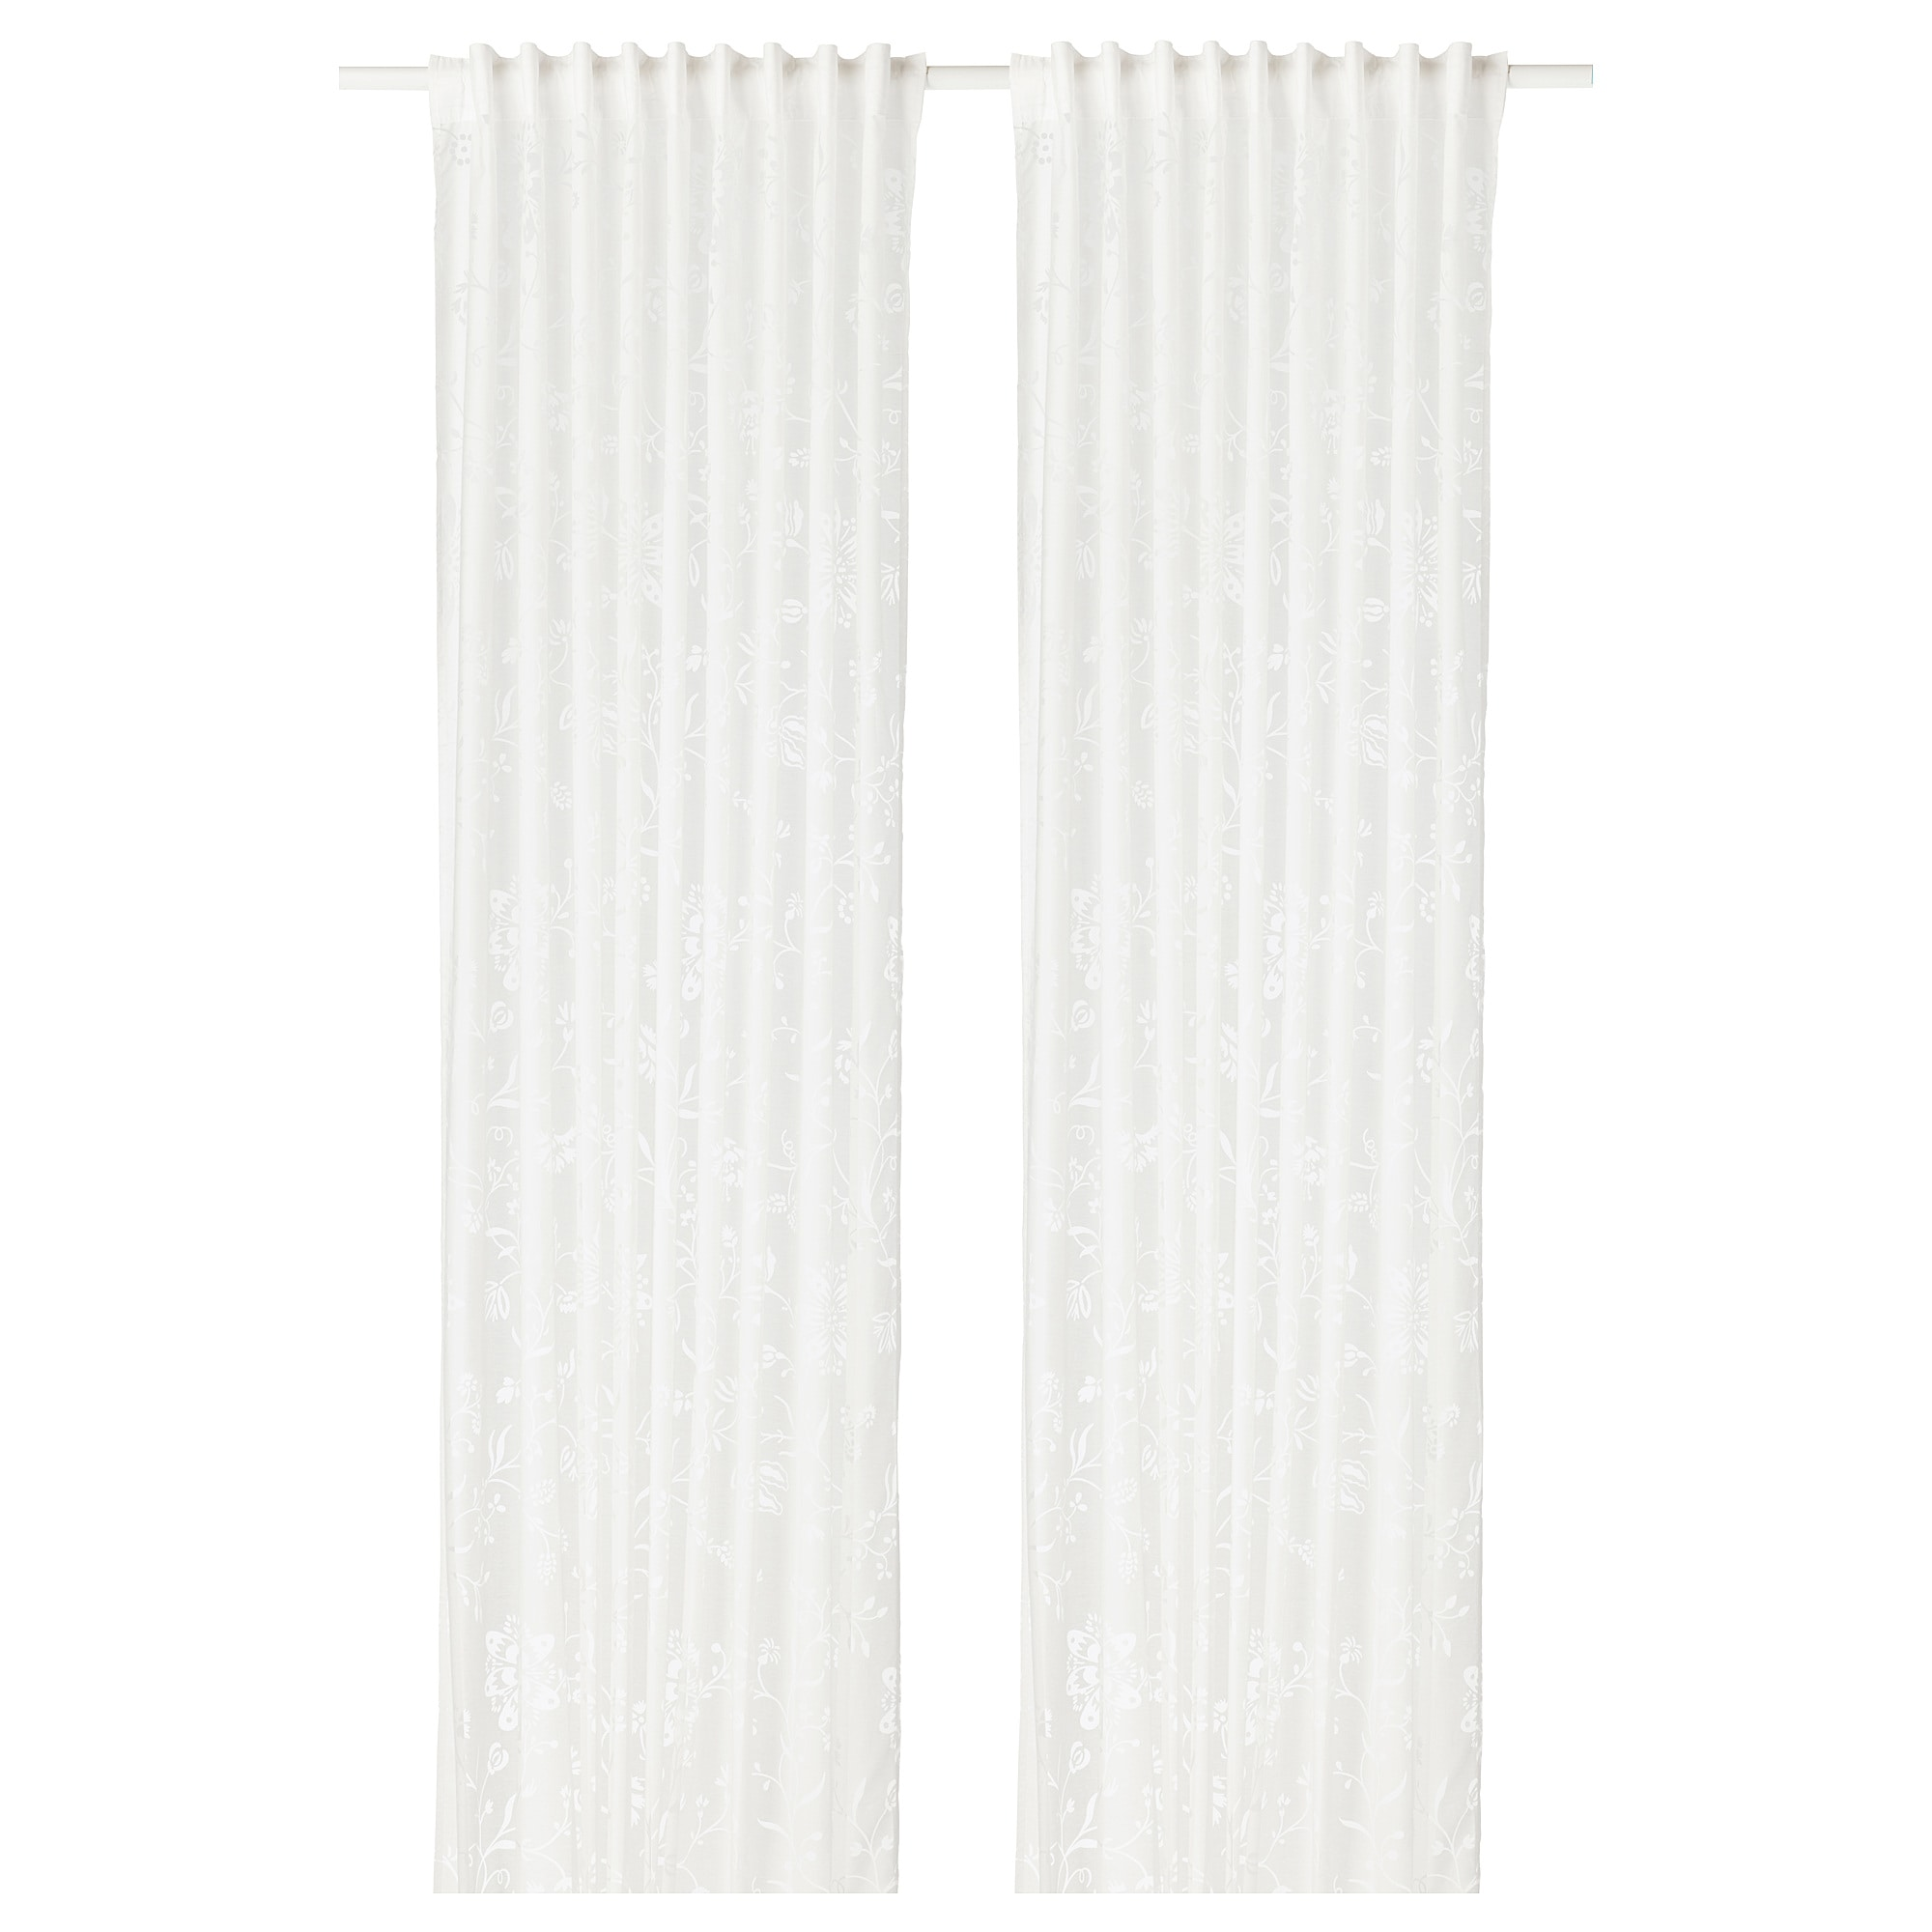 Q0pair Ikea White Curtains Borghild Panel Sheer Bedroom